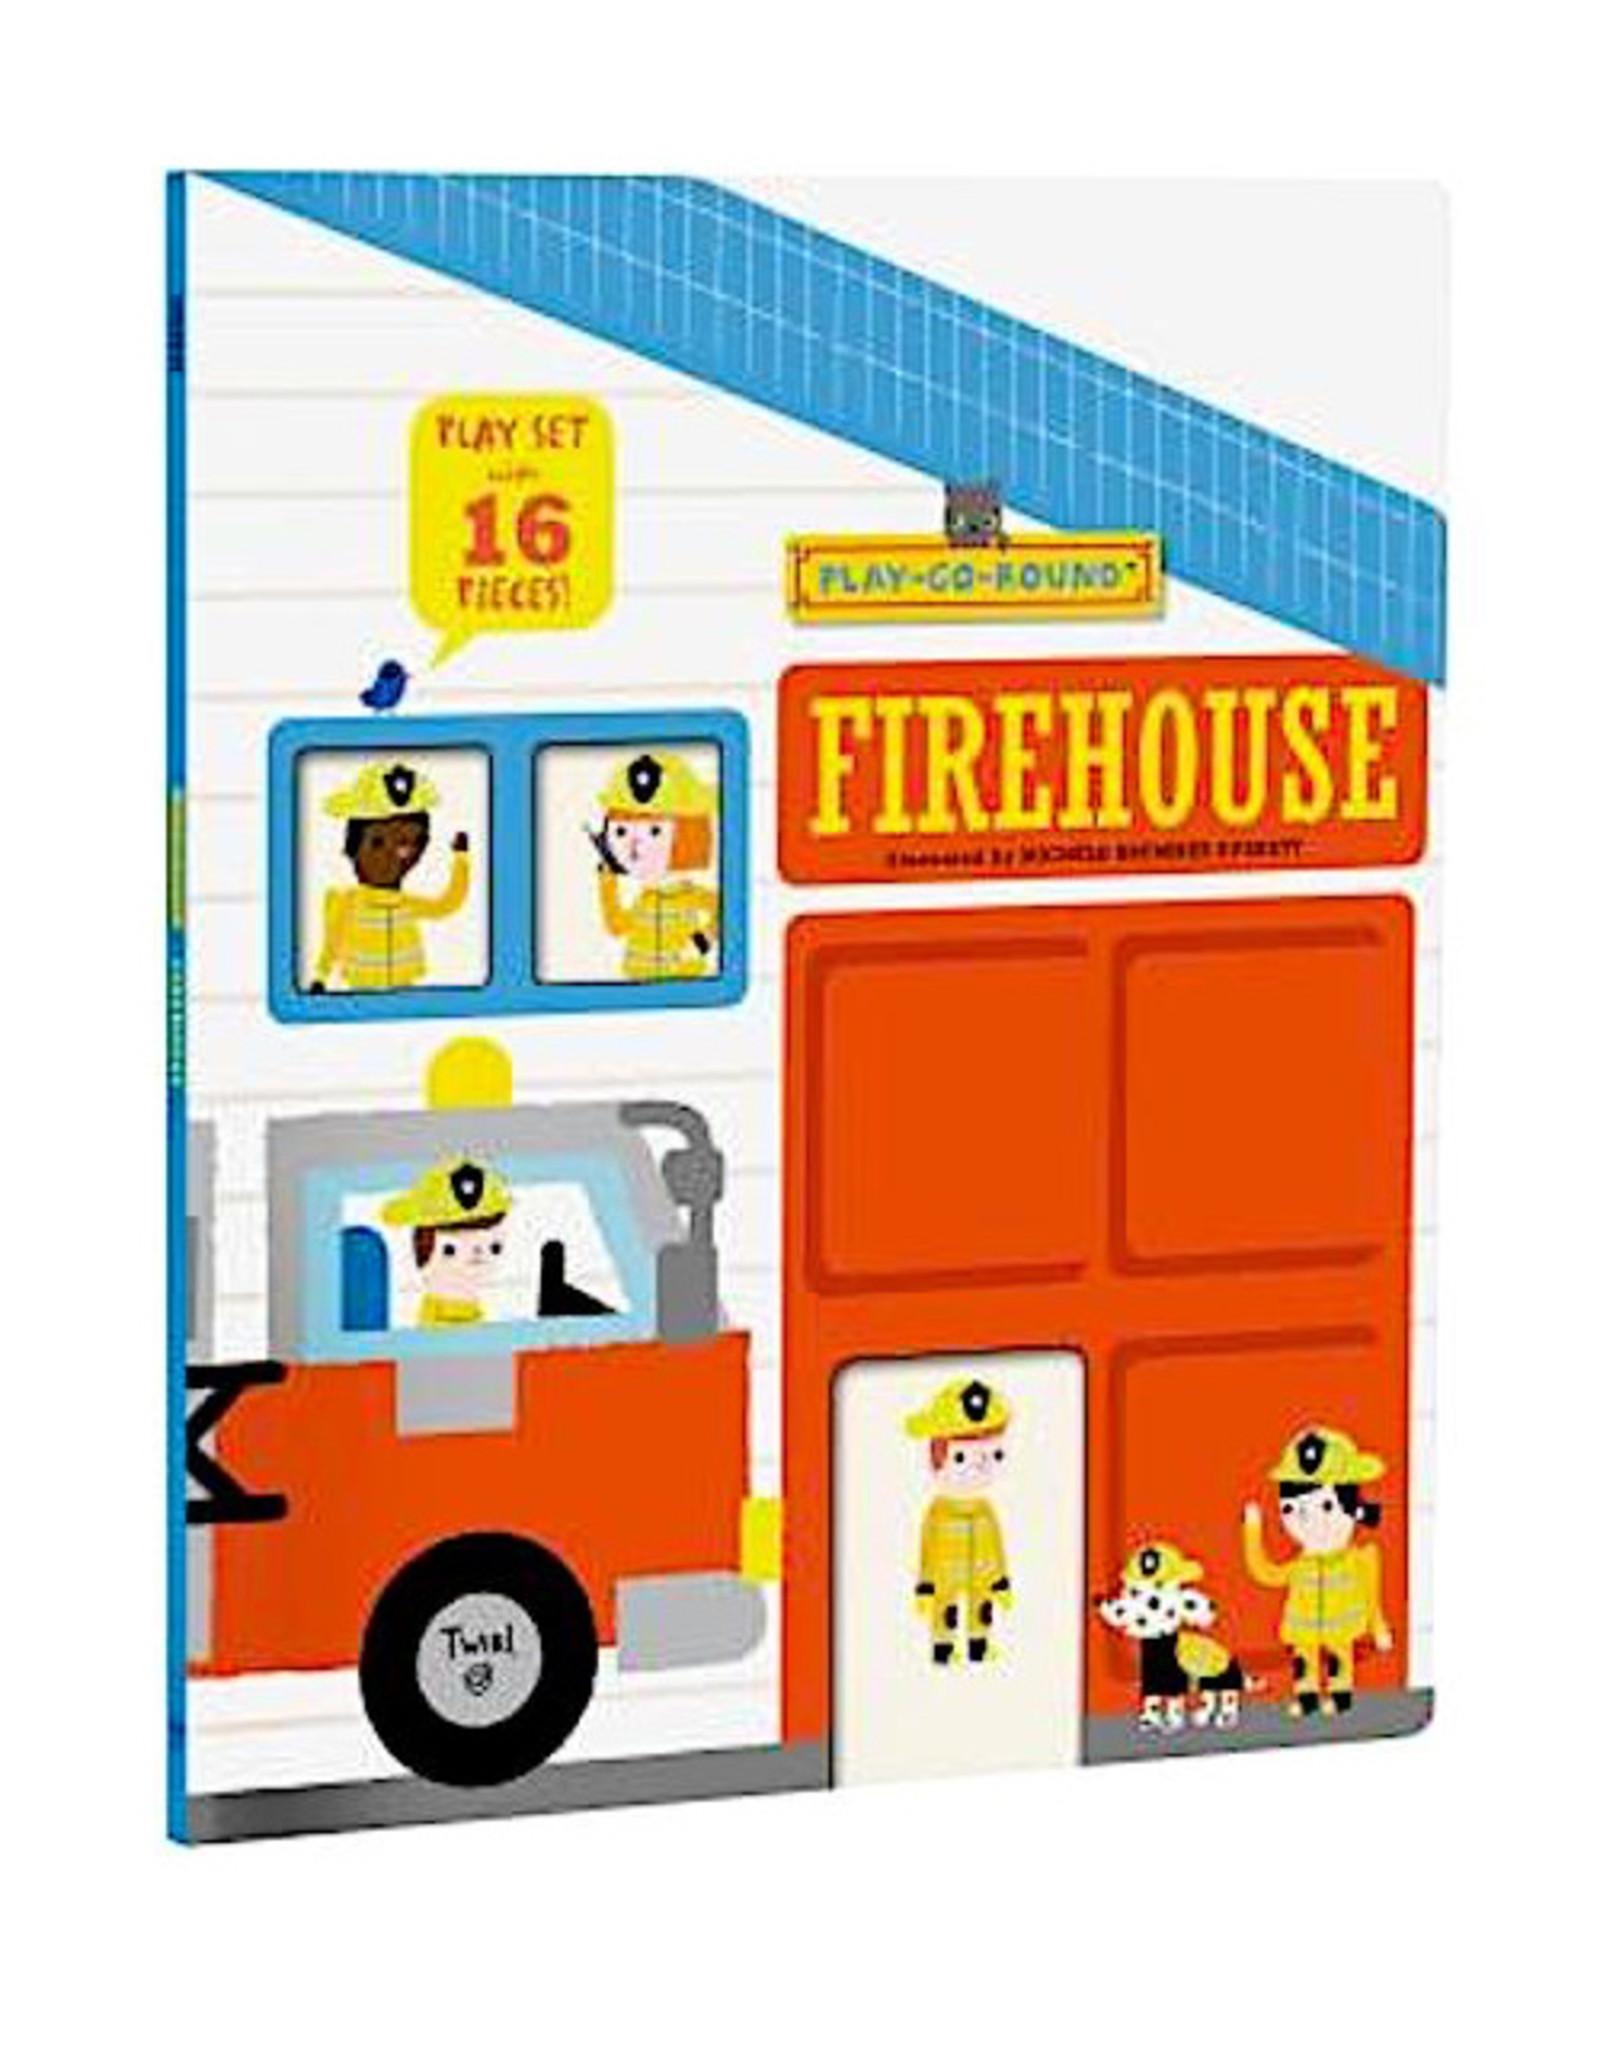 Hachette Books Firehouse: Play Go Round